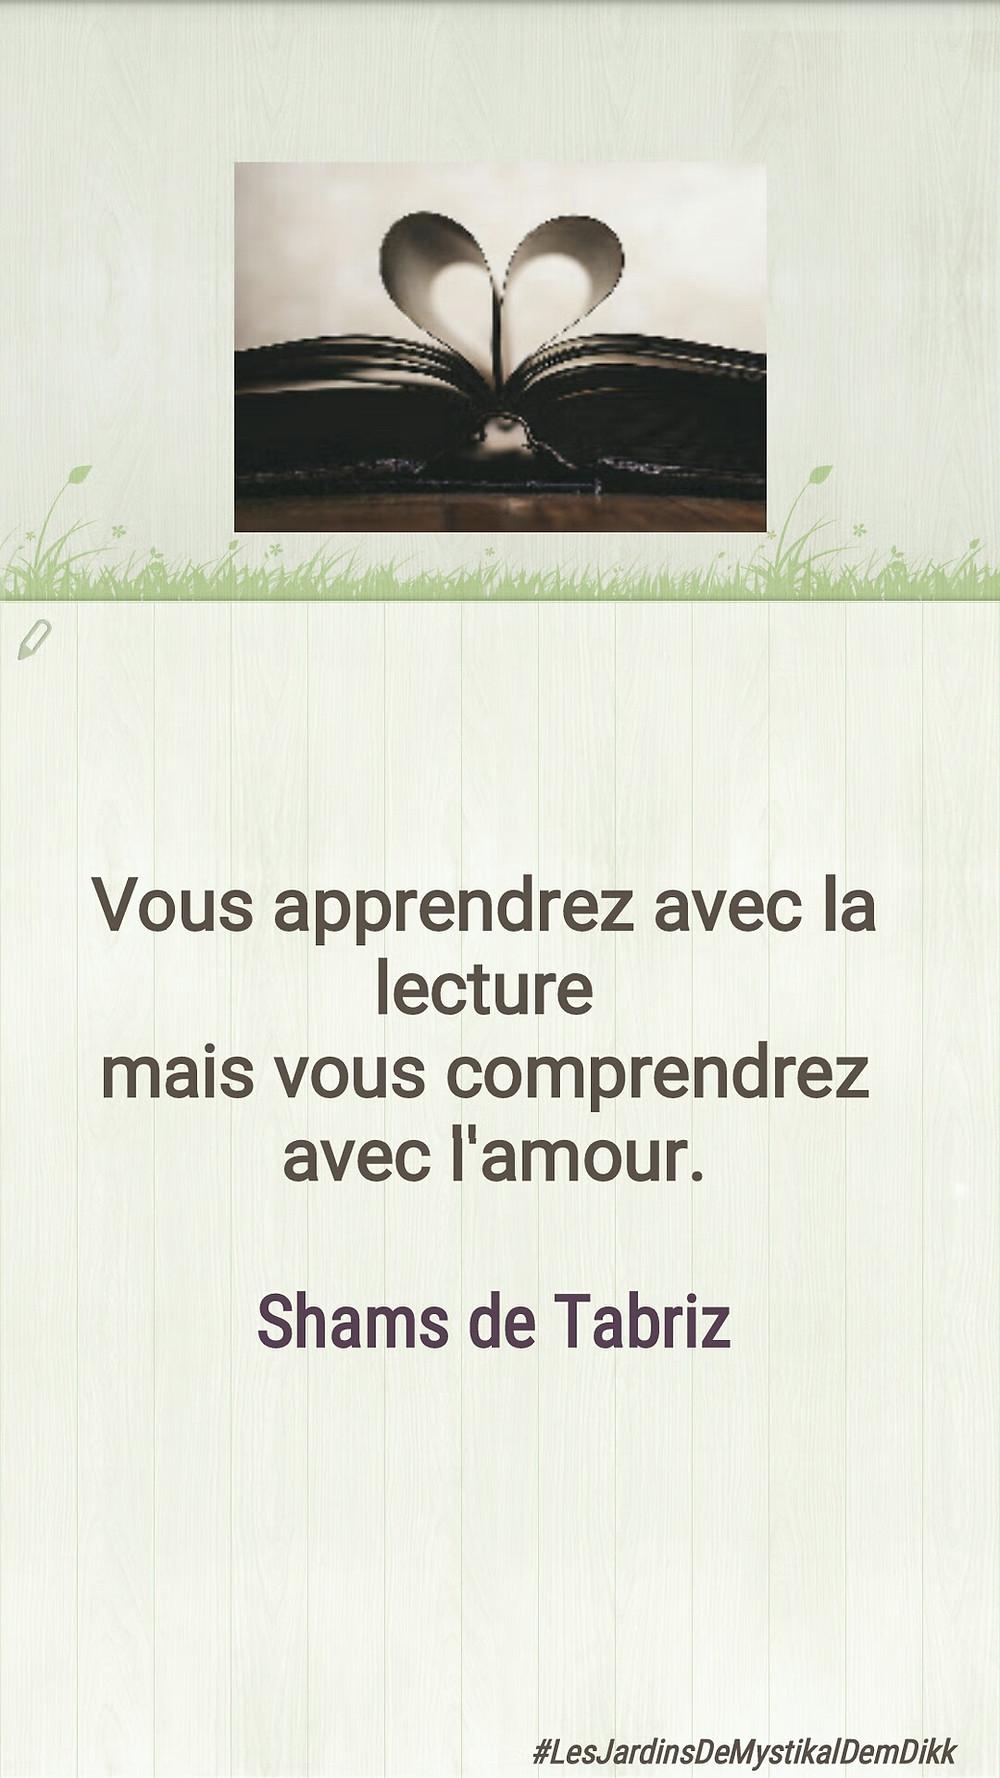 Shams de Tabriz